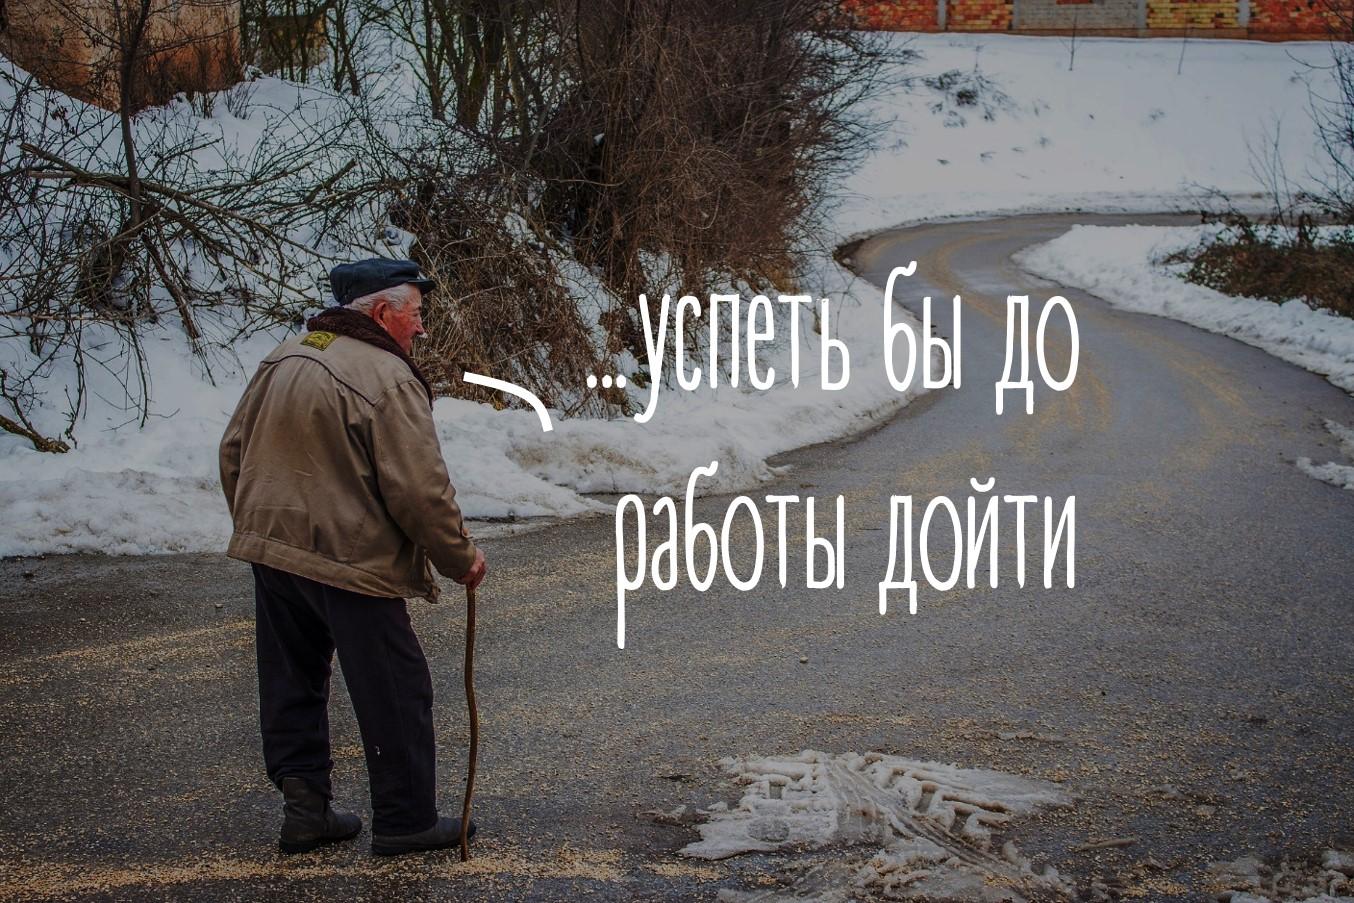 повышают пенсионный возраст http://grosh-blog.ru